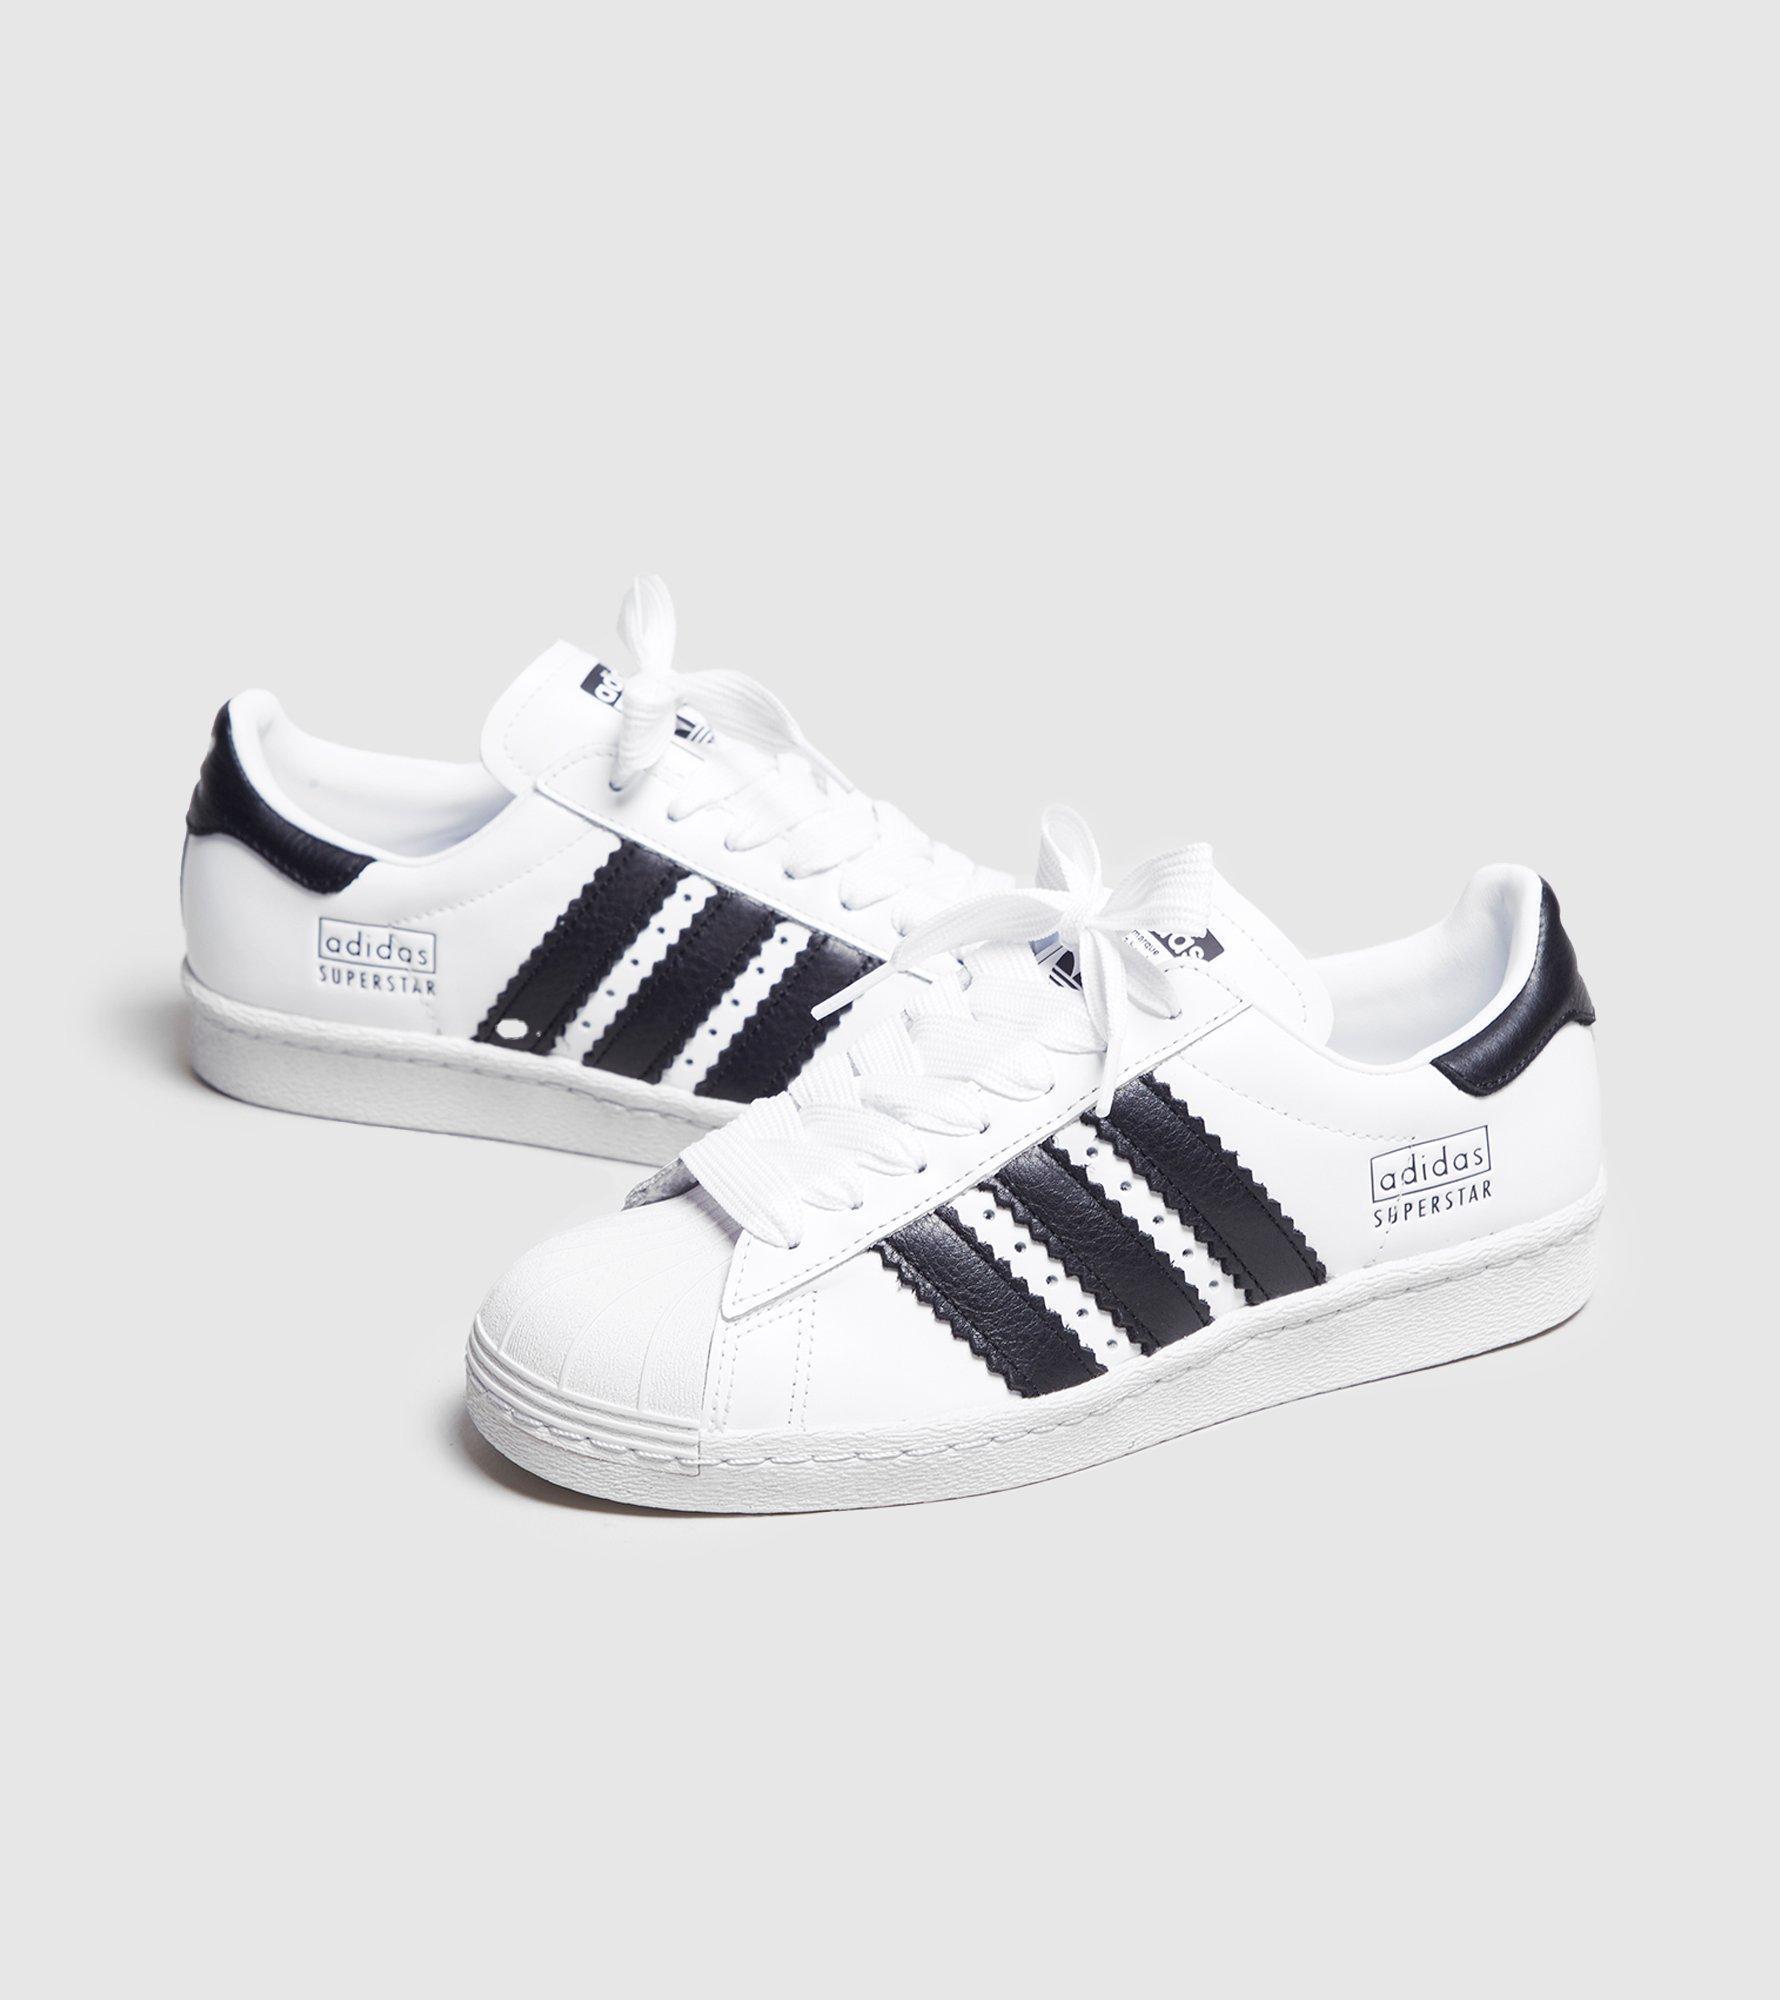 adidas Superstar Fat Stripes Women Shoes